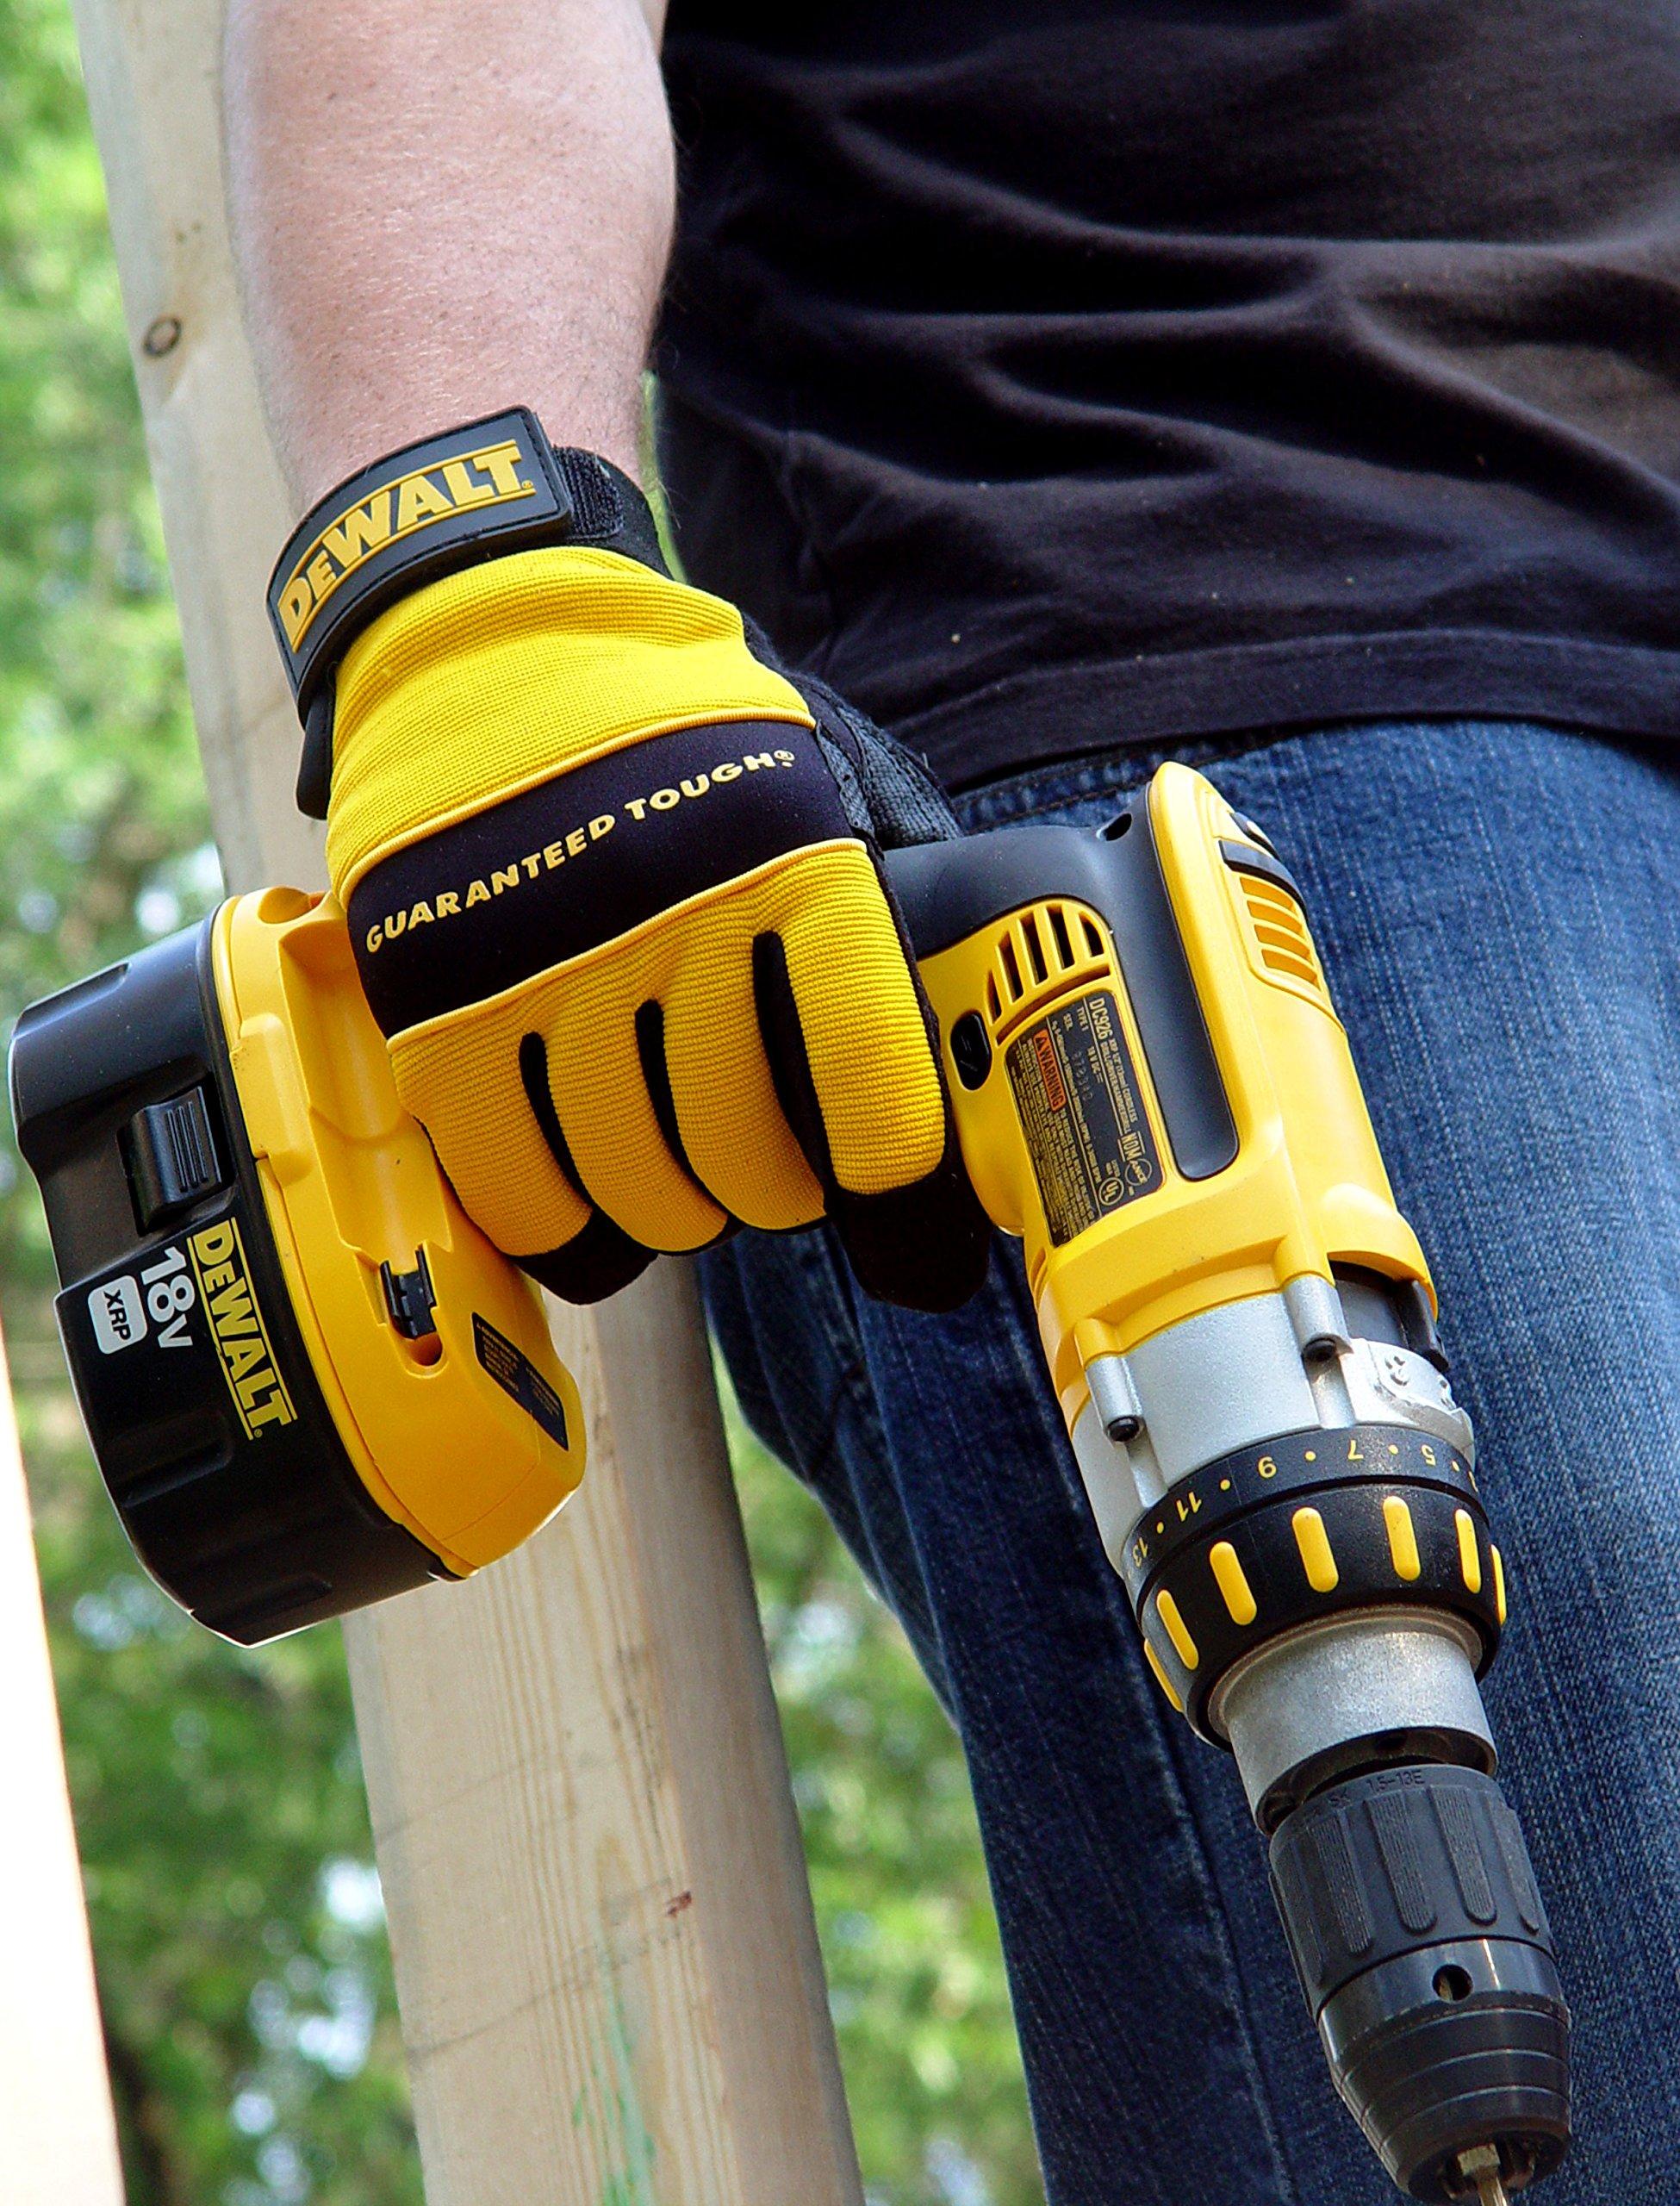 Dewalt DPG20L All Purpose Synthetic Leather Palm Spandex Back Velcro Wrist Work Glove, Large by DEWALT (Image #4)